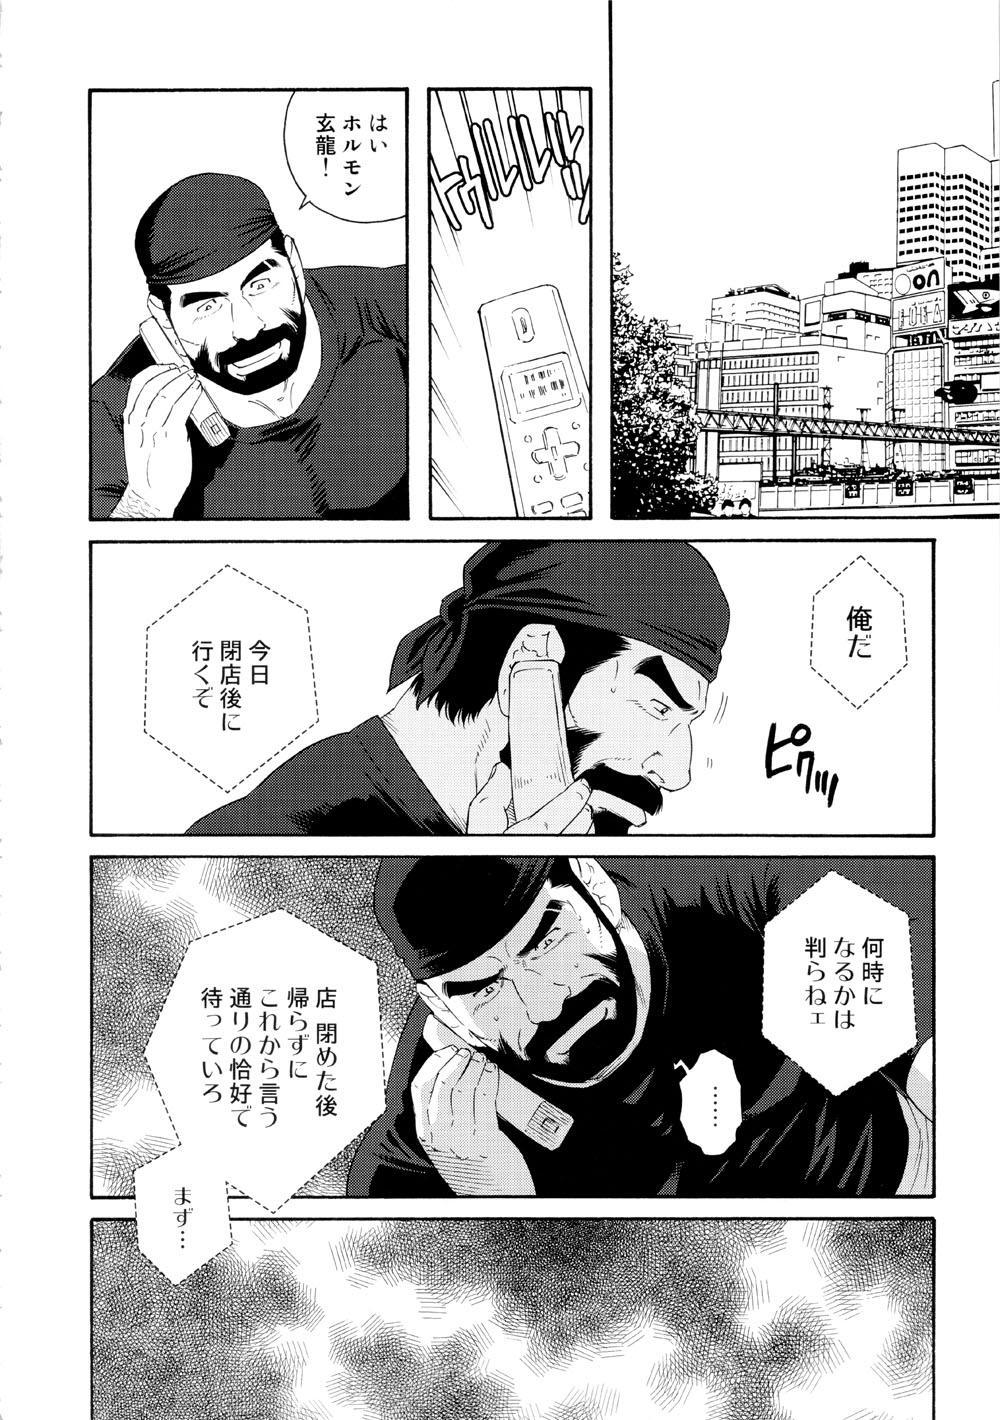 Genryu Chapter 3 5